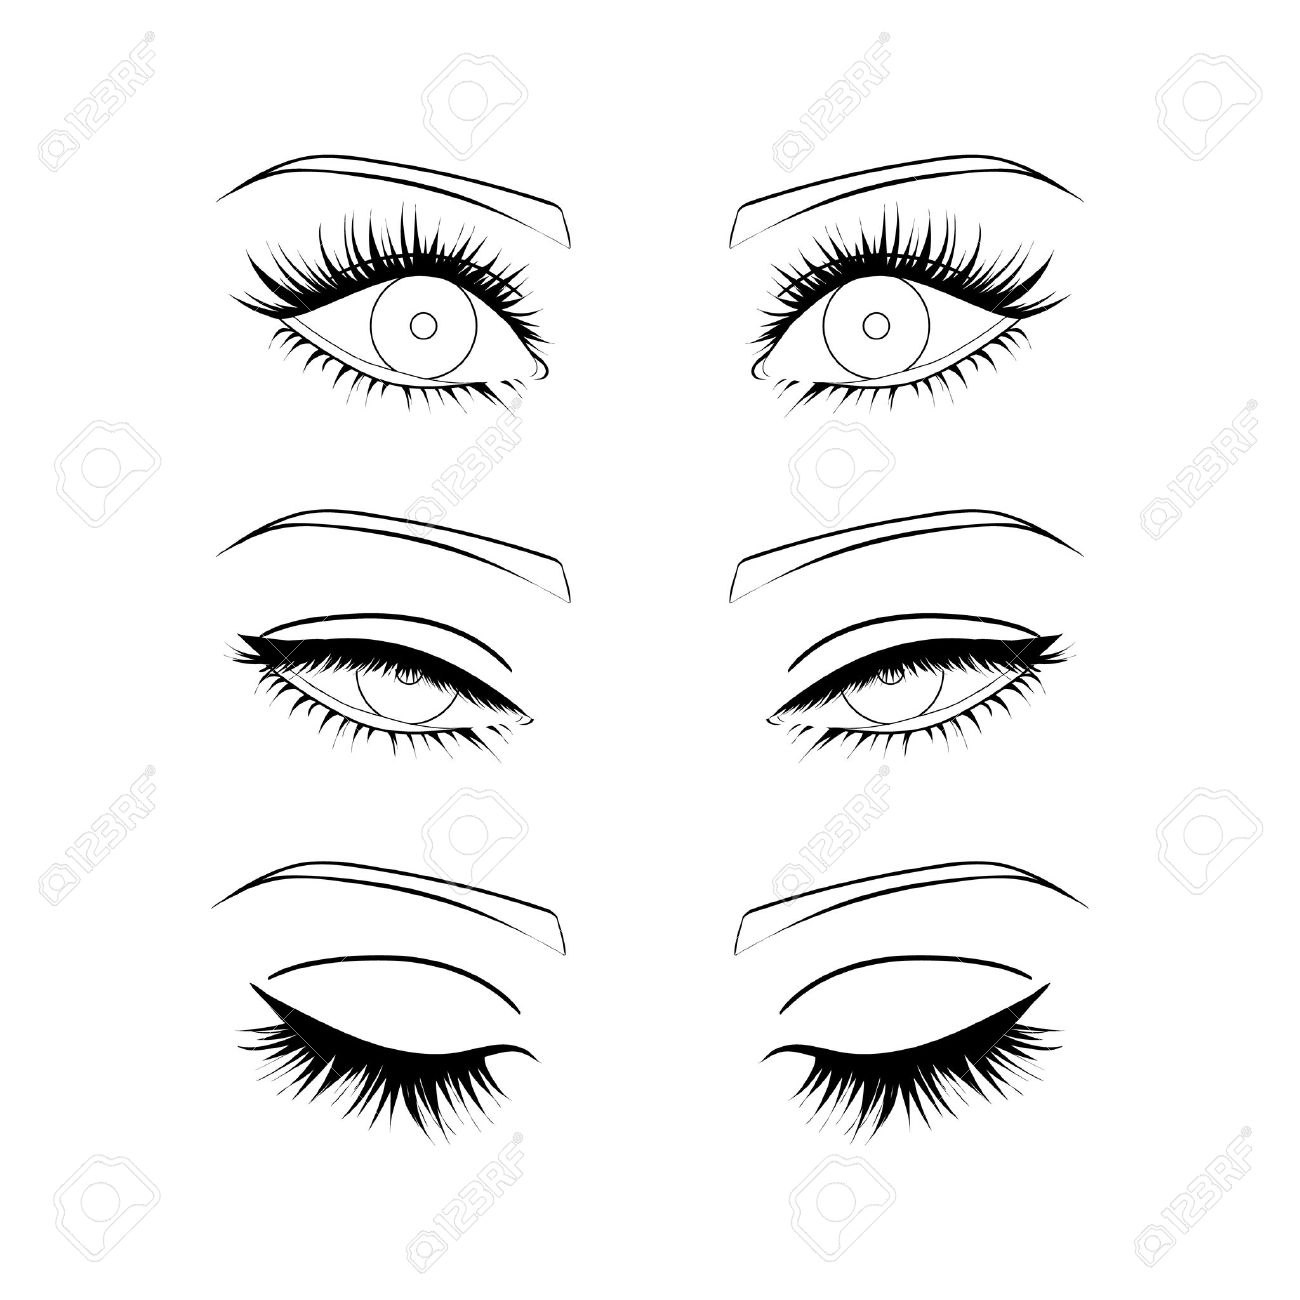 Female eyes outline. open, closed half-open eyes - 61119096